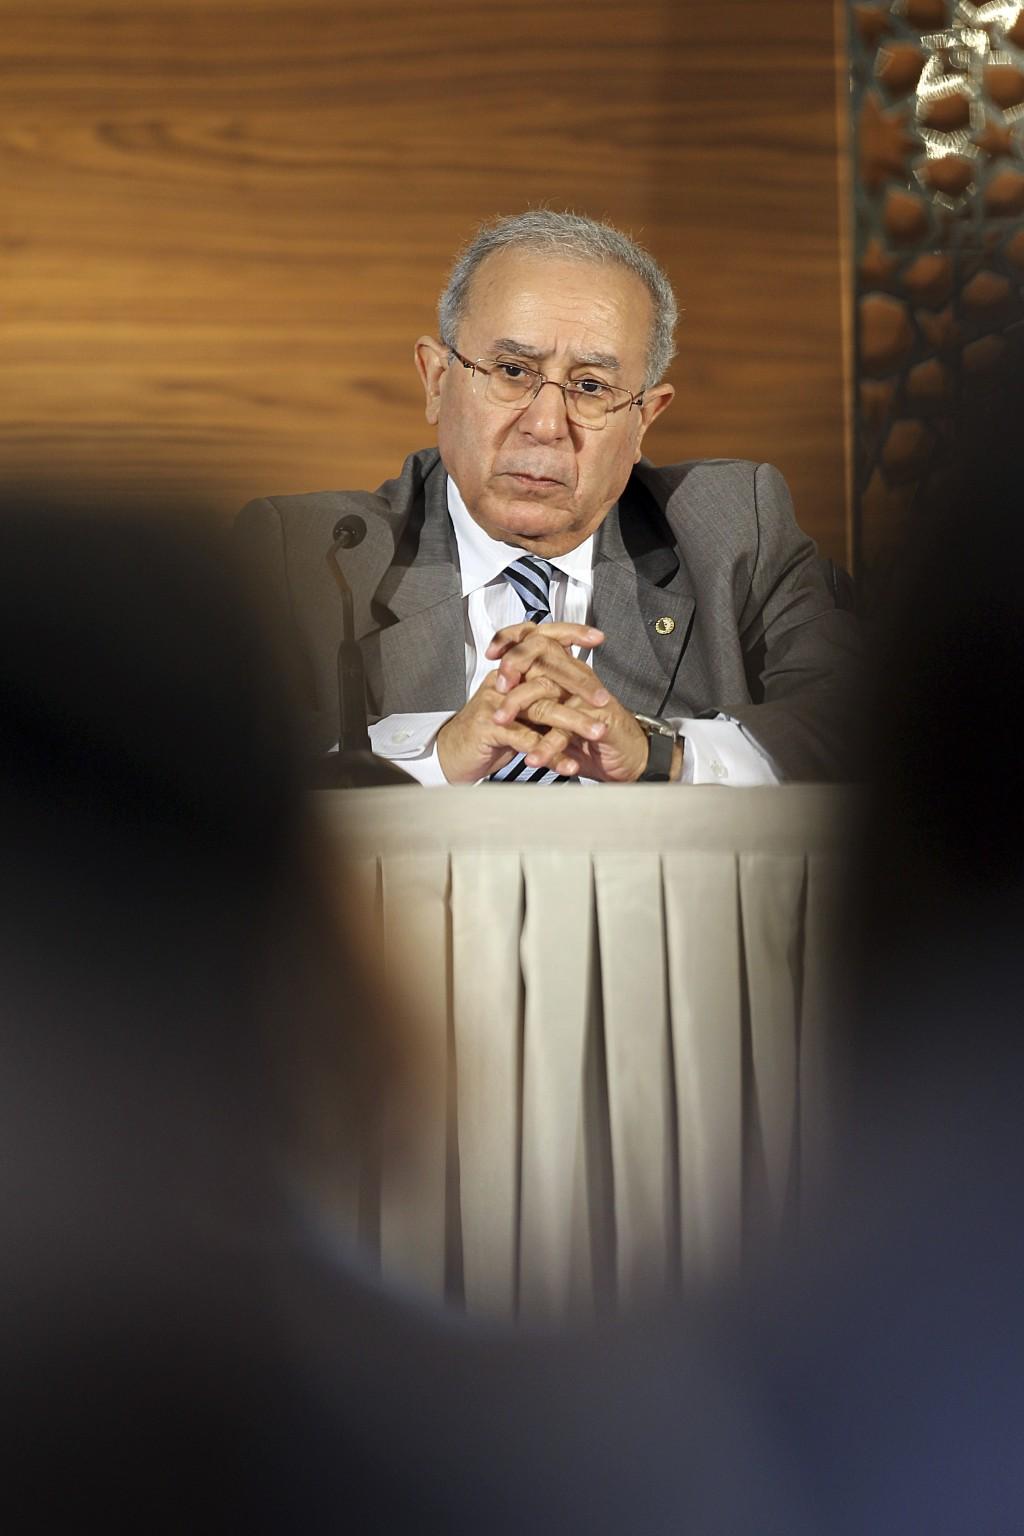 Algeria's Vice Prime Minister Ramtane Lamamra gives a press conference, in Algiers, Algeria, Thursday, March 14, 2019. Algeria's new prime minister is